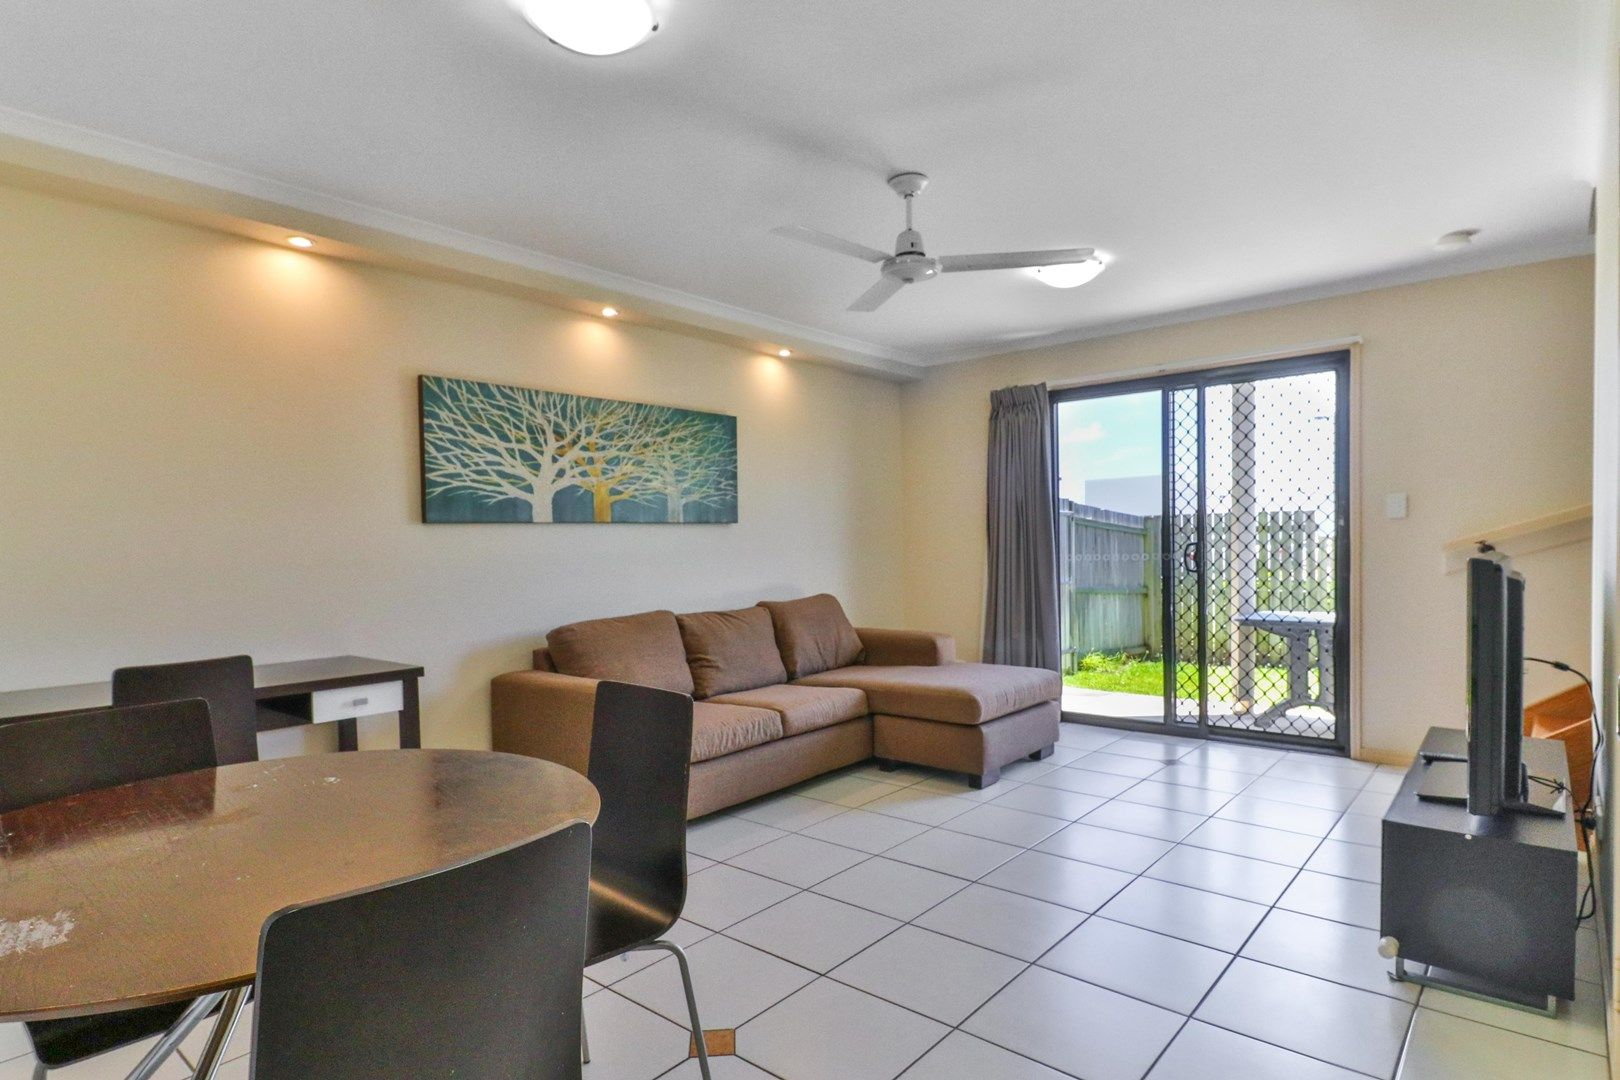 21/56-58 Main Street, Pialba QLD 4655, Image 0